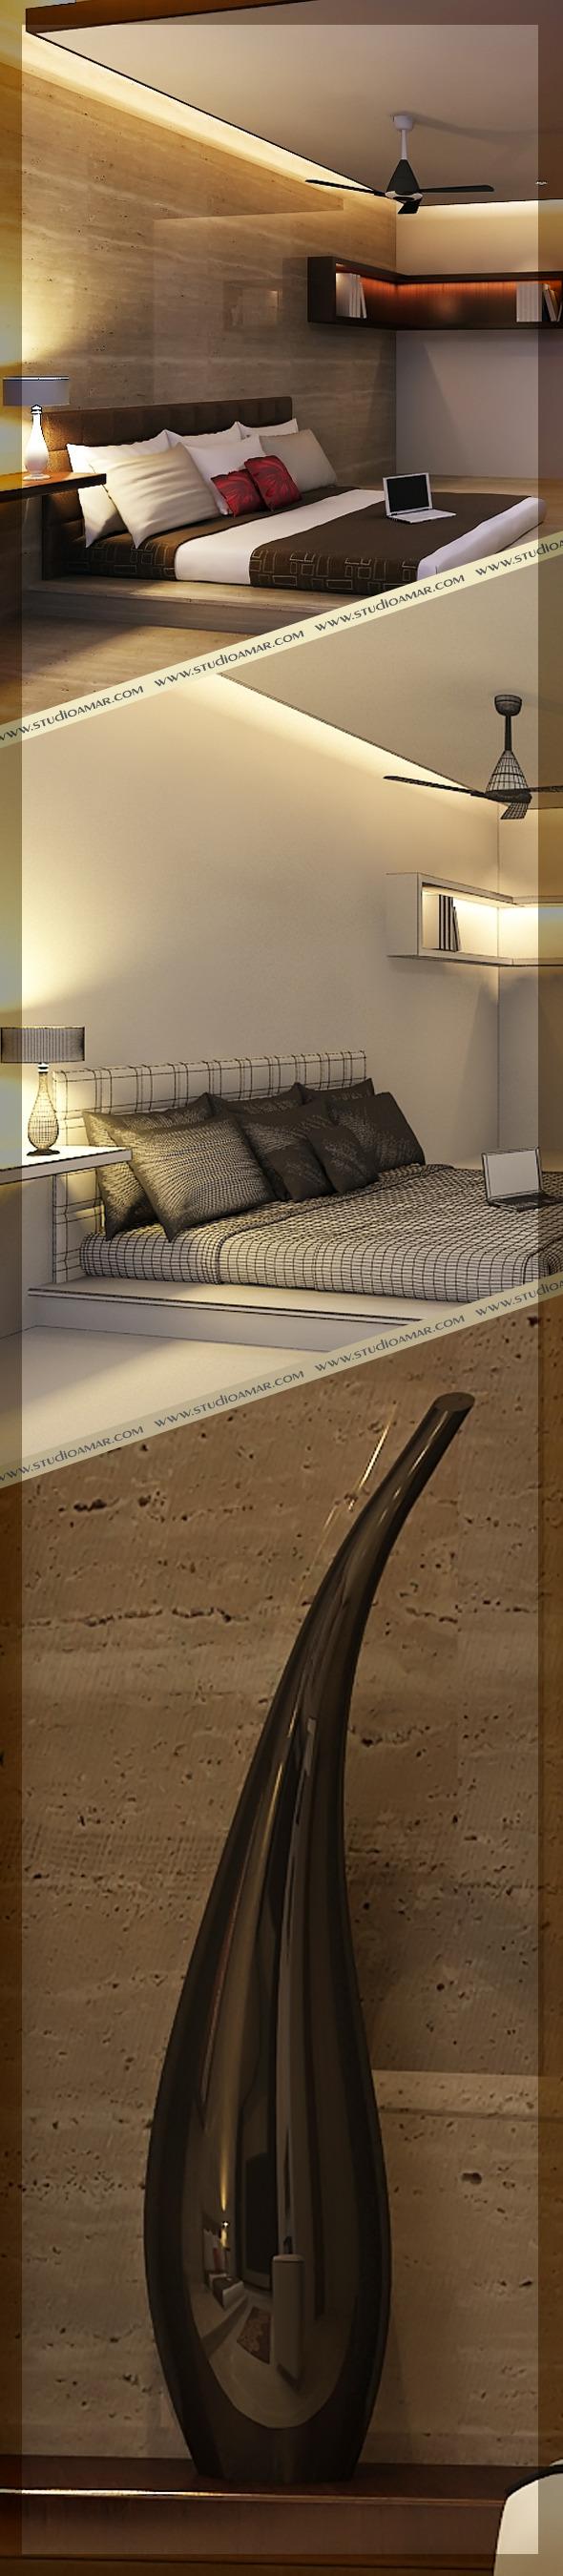 3DOcean Realistic Bed Room 122 7407703